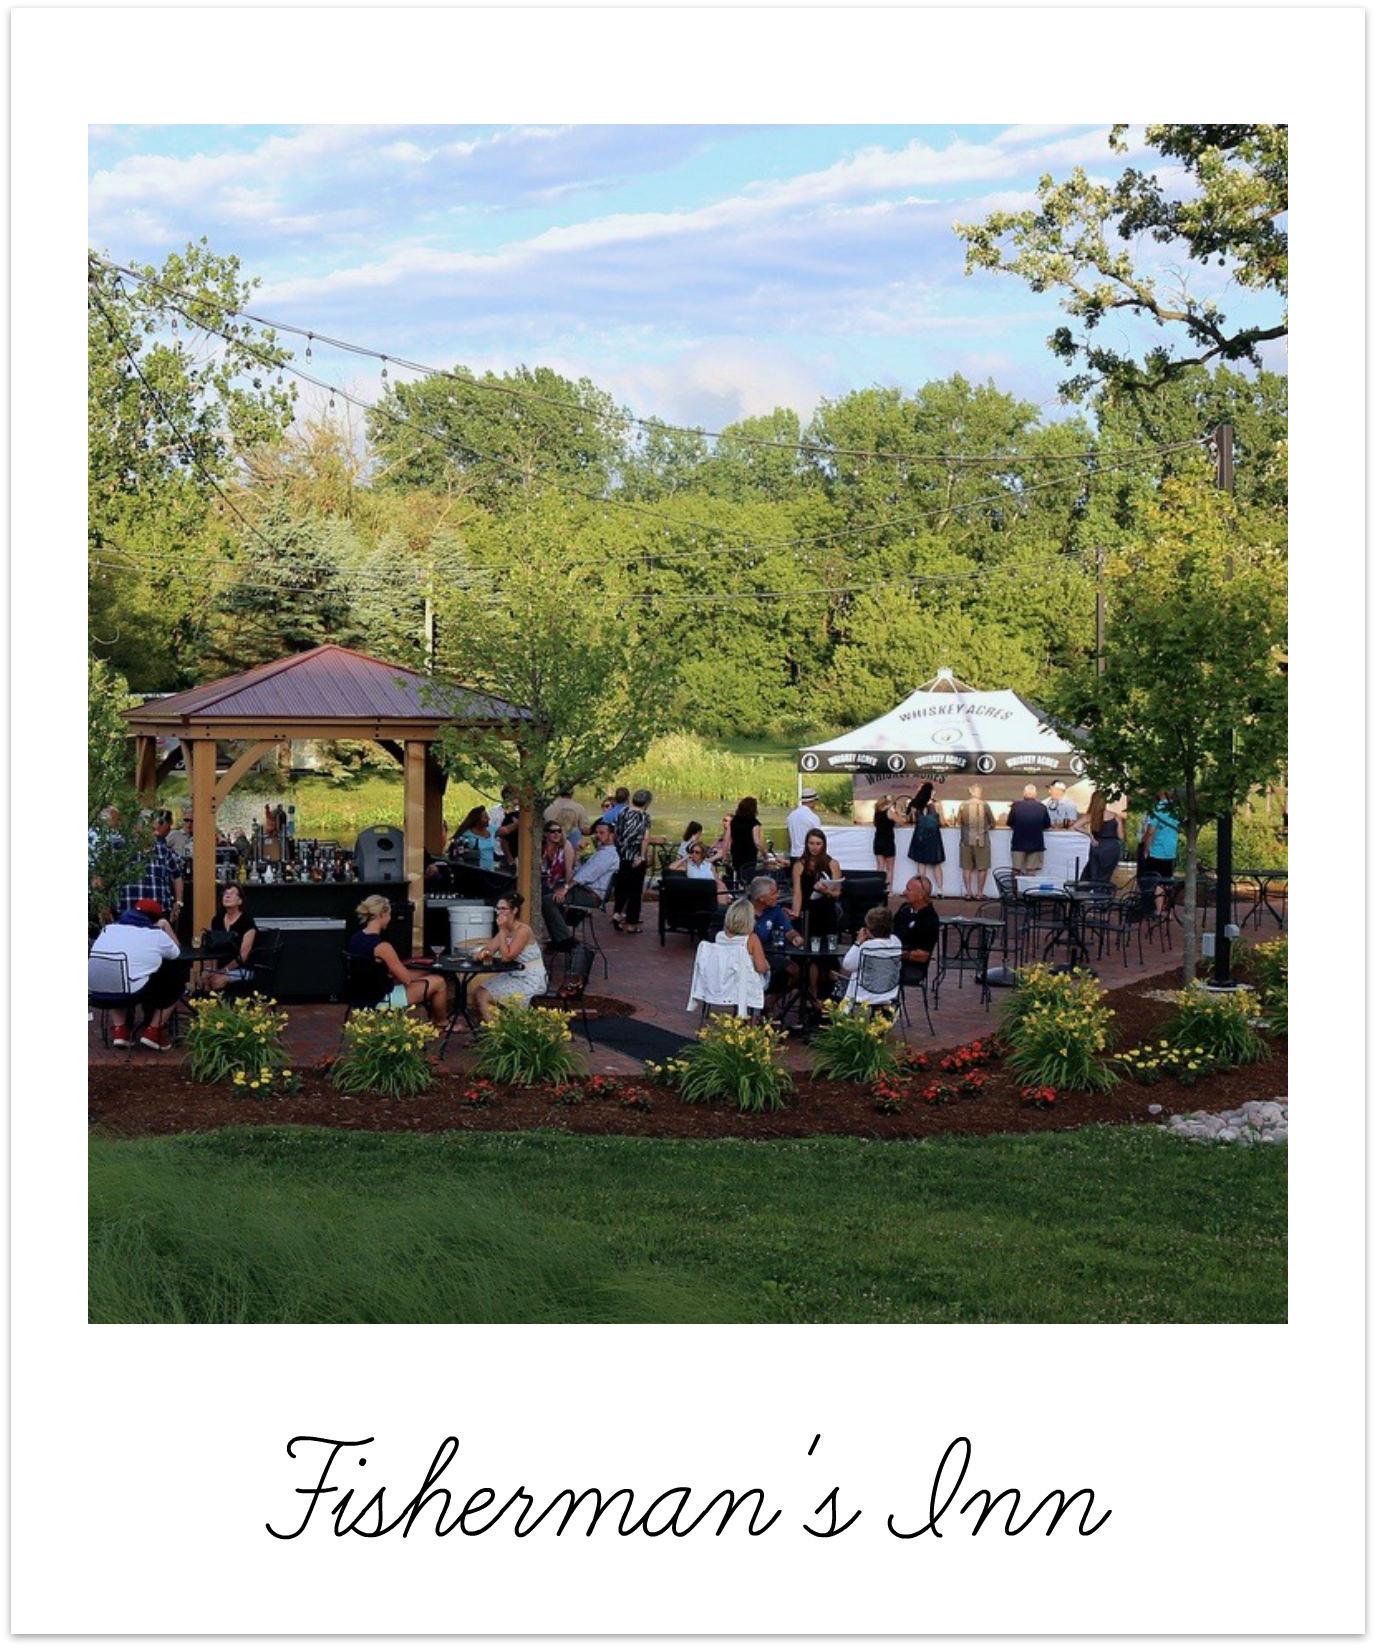 Elburn Illinois Fisherman's Inn Patio BRIX Picks